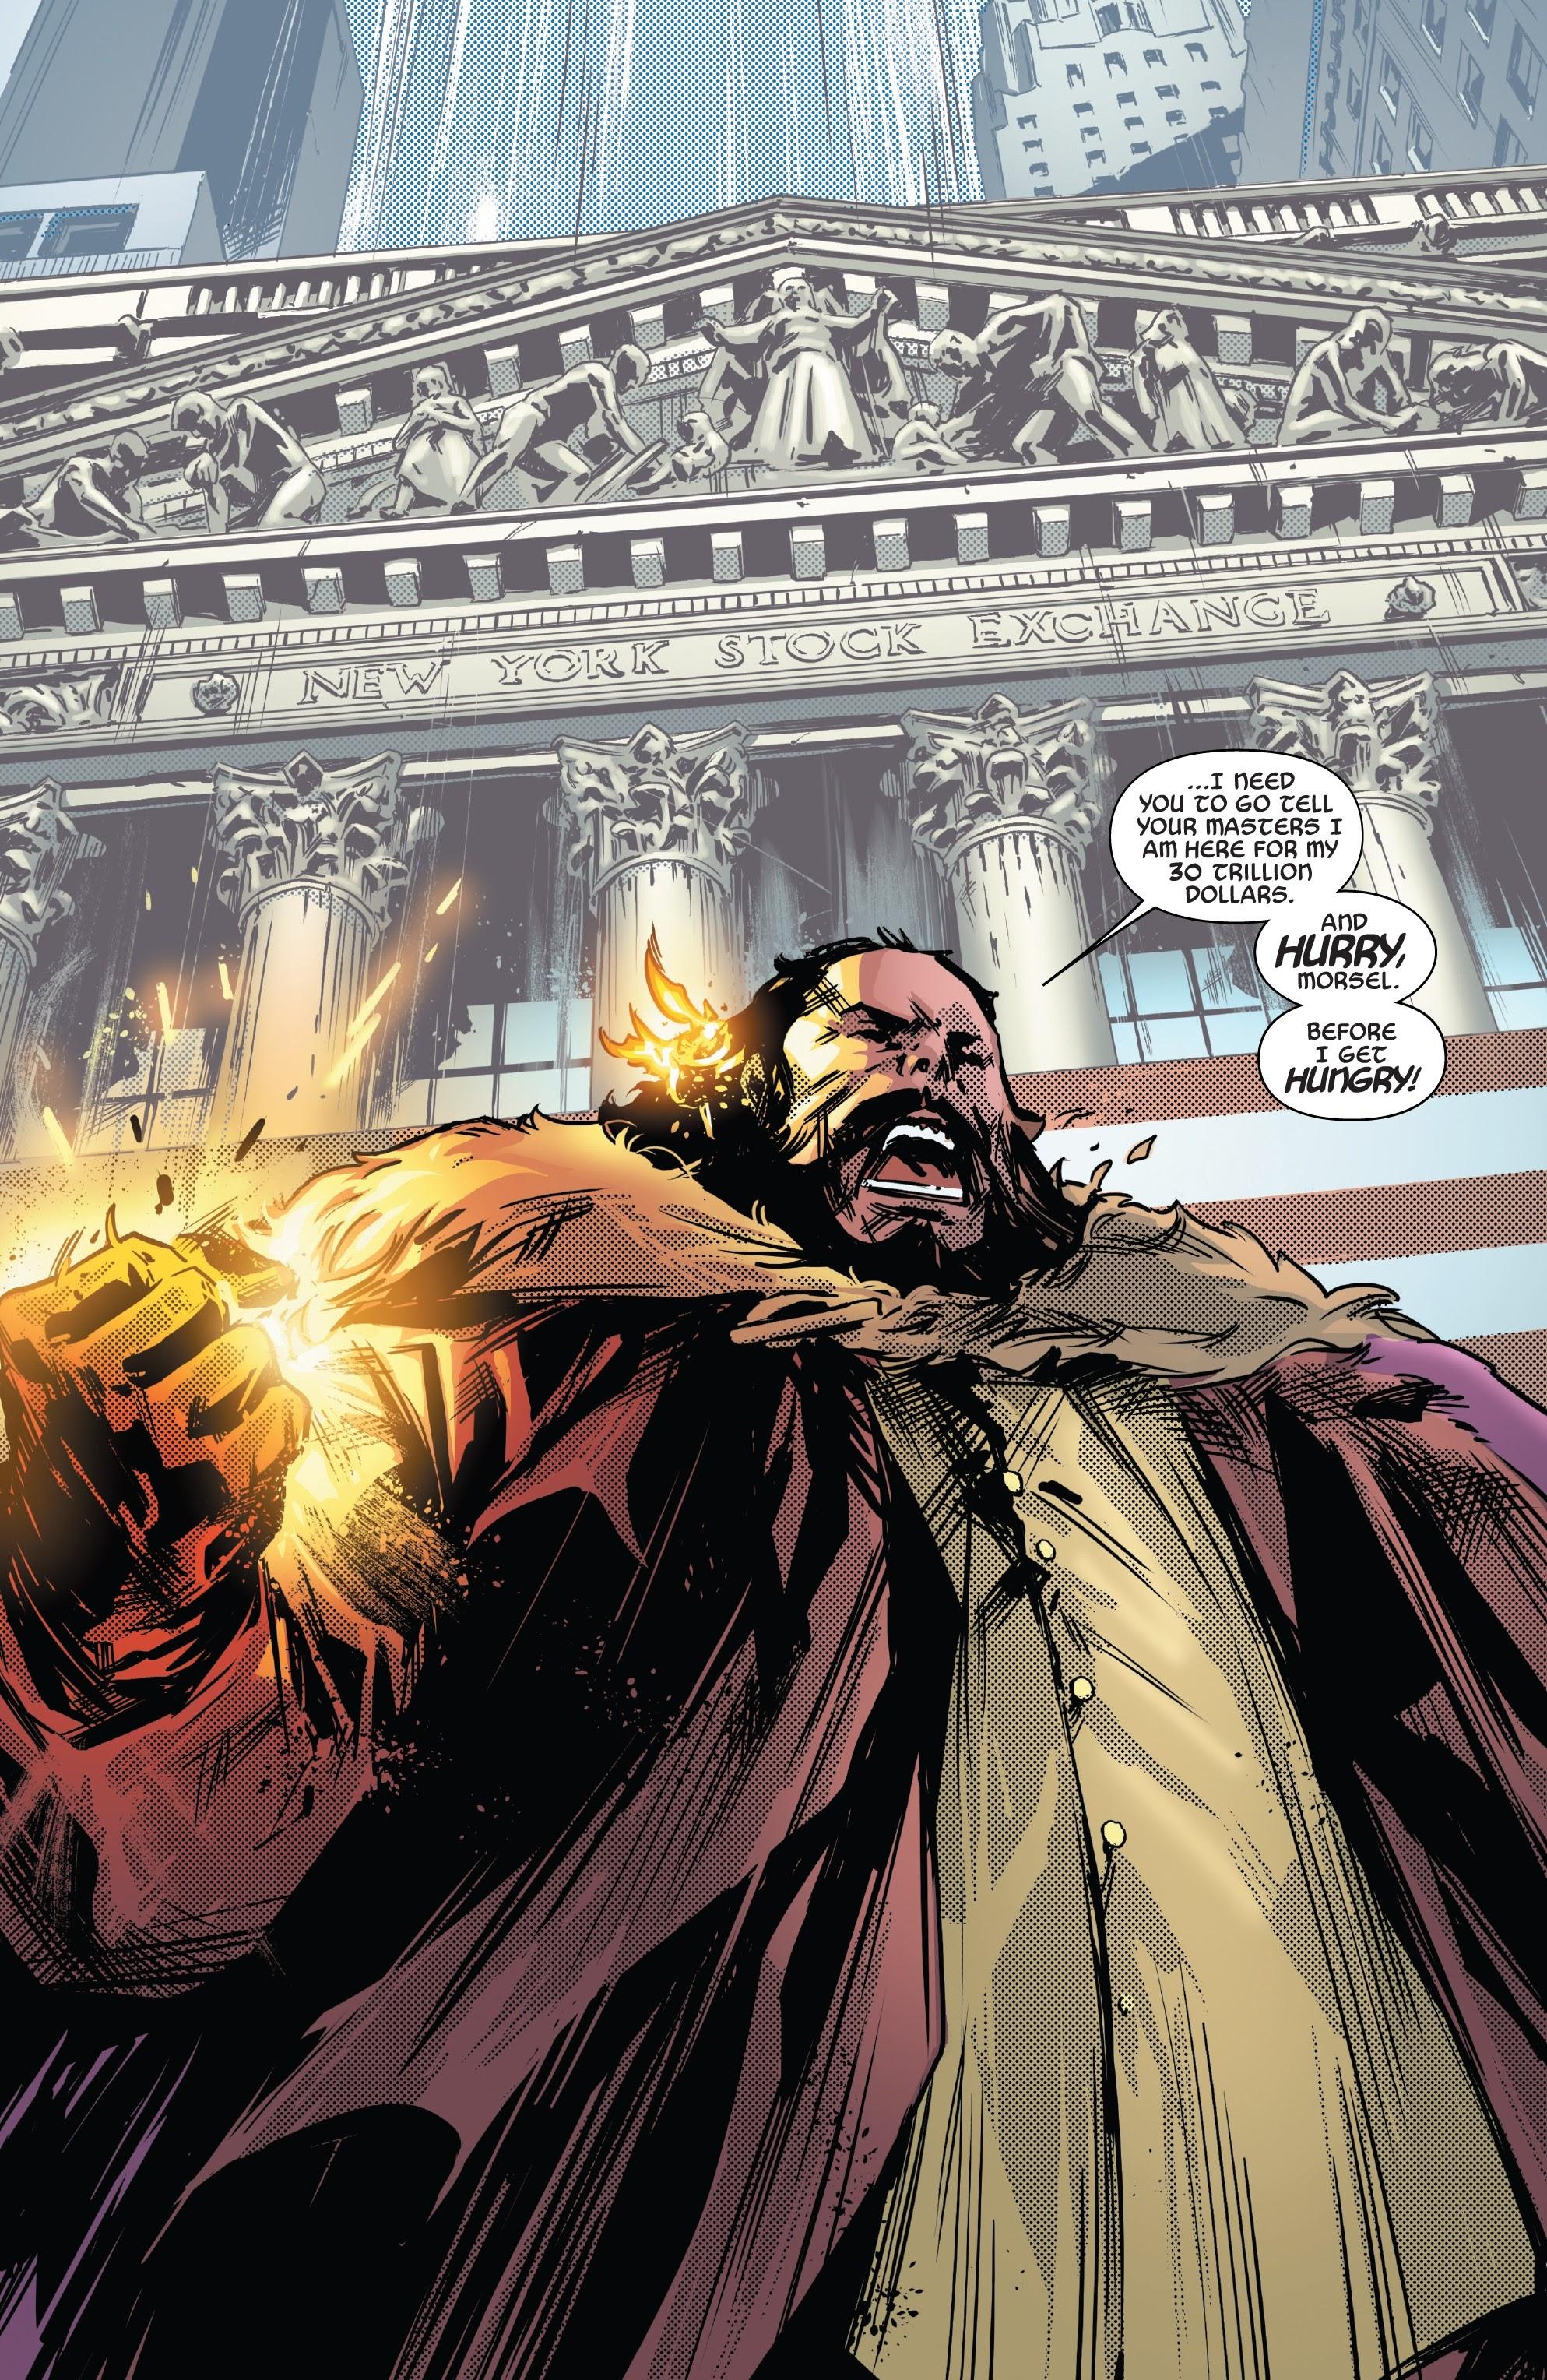 Read online Tony Stark: Iron Man comic -  Issue #13 - 4